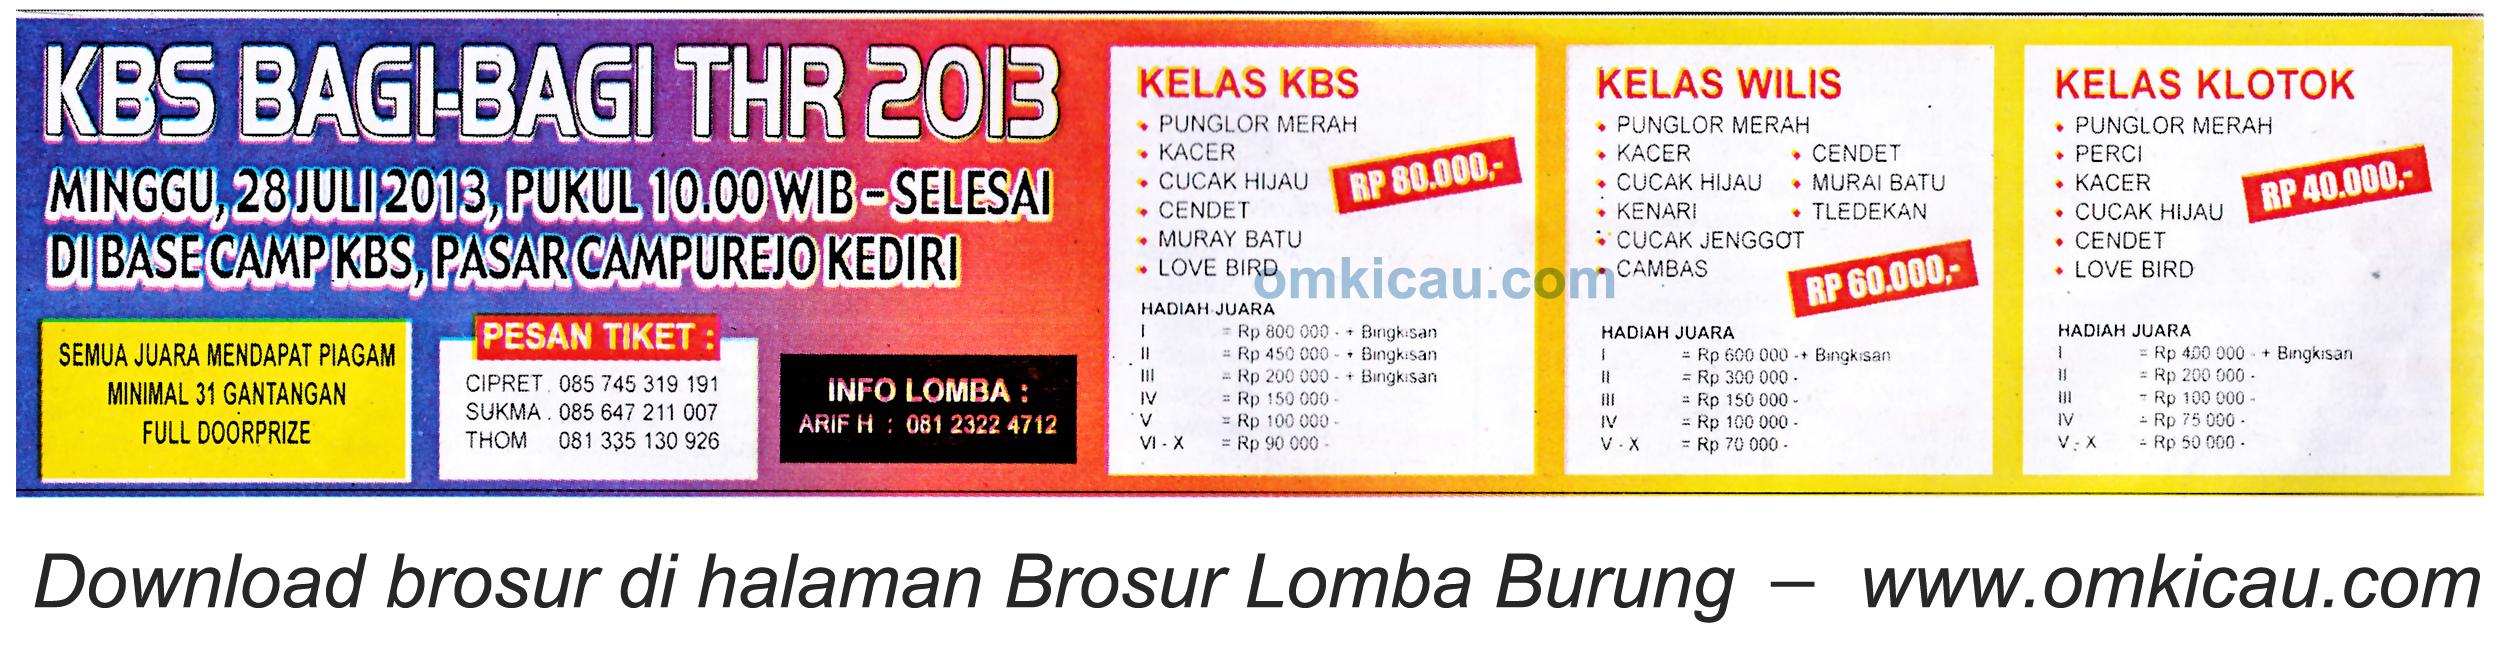 Brosur Lomba Burung KBS Bagi-bagi THR - Kediri 28 Juli 2013